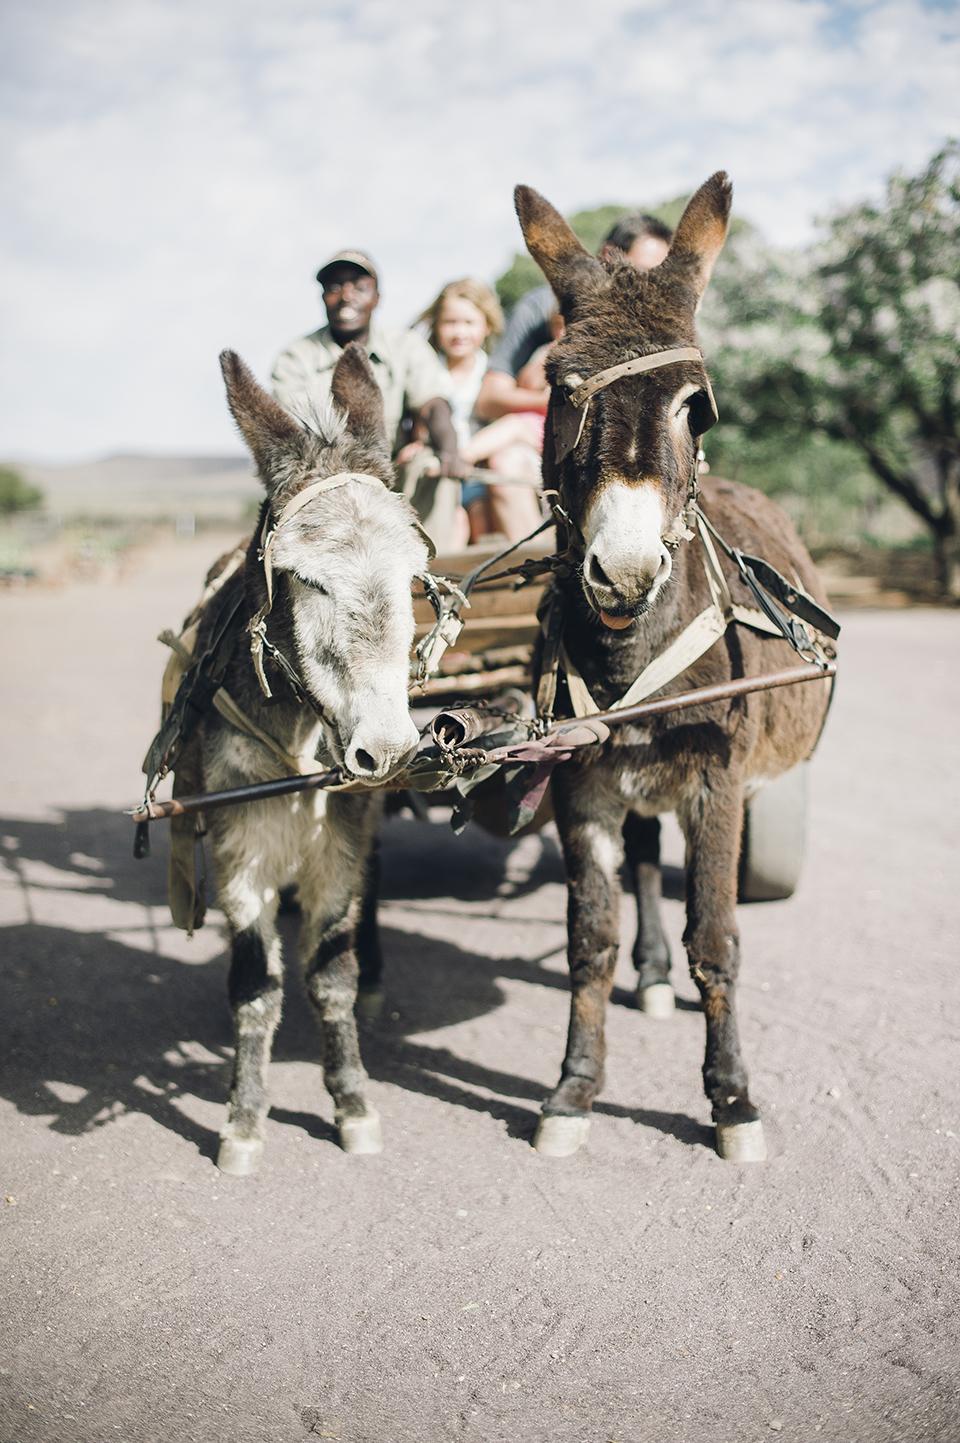 RyanParker_FineArtPhotographer_Travel_Karoo_Bloemhof_DSC_9158.jpg